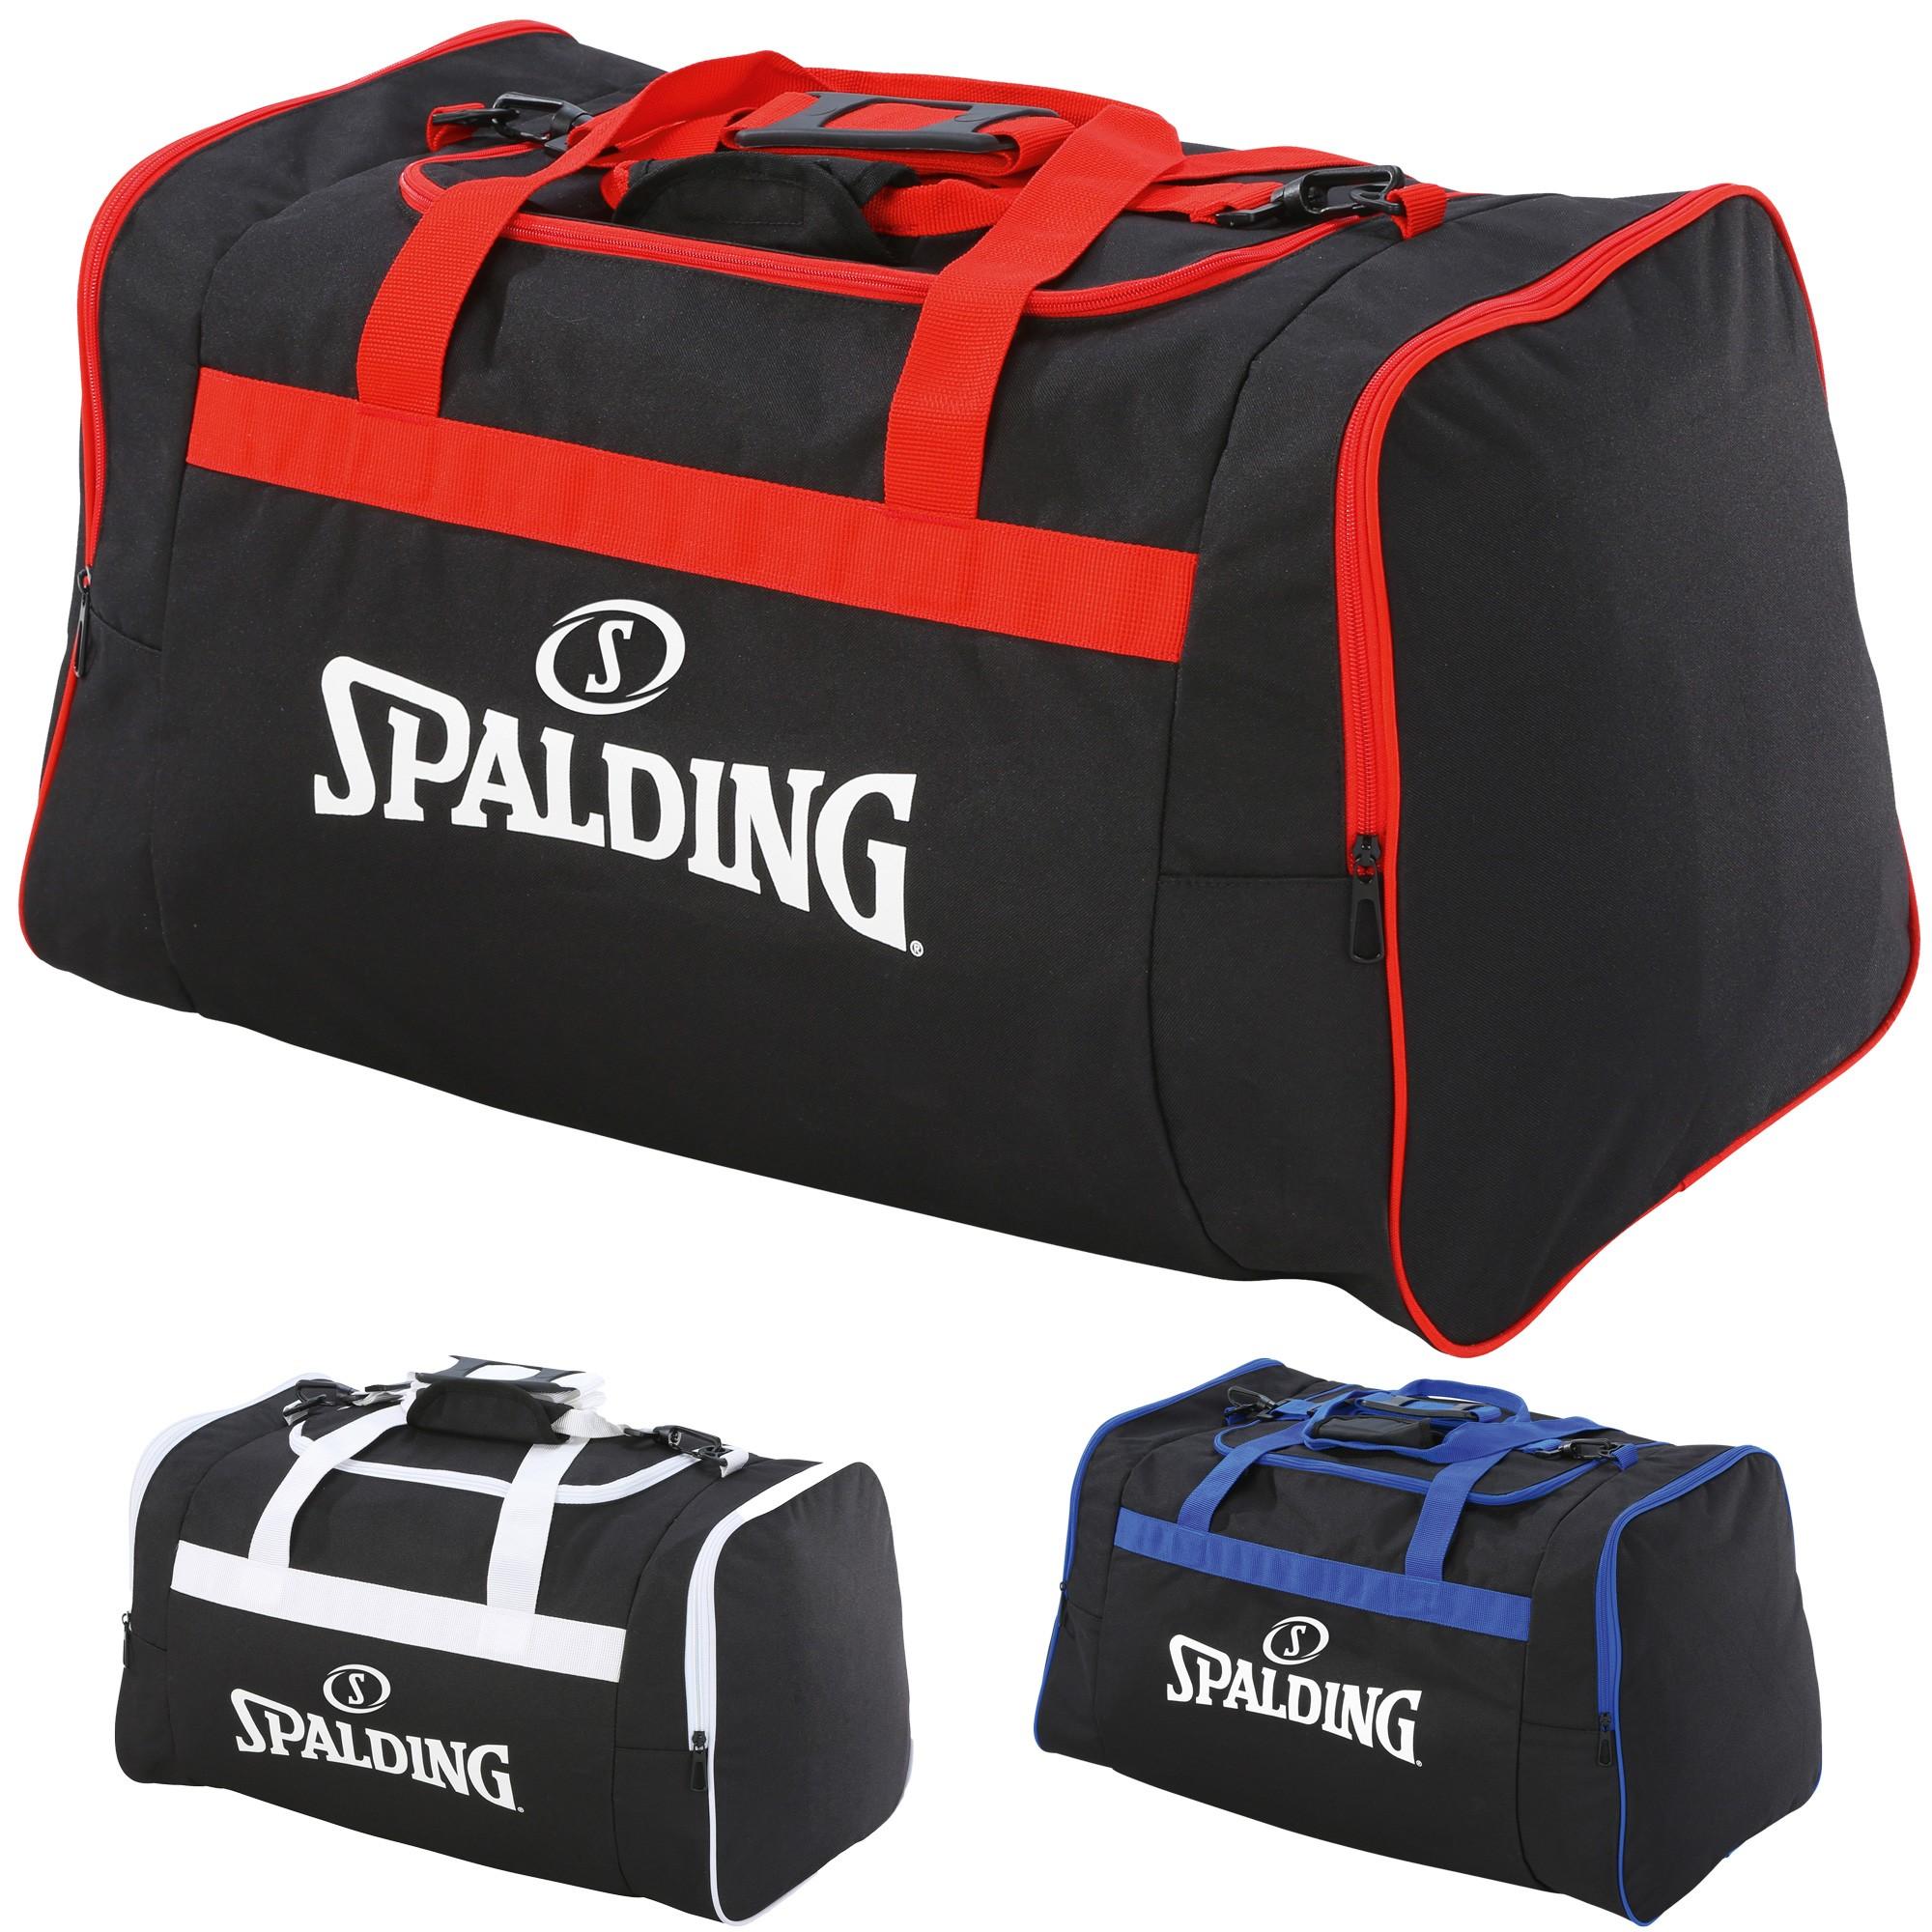 6a90573458 Sac de sport Spalding Team Medium | Integral Sport